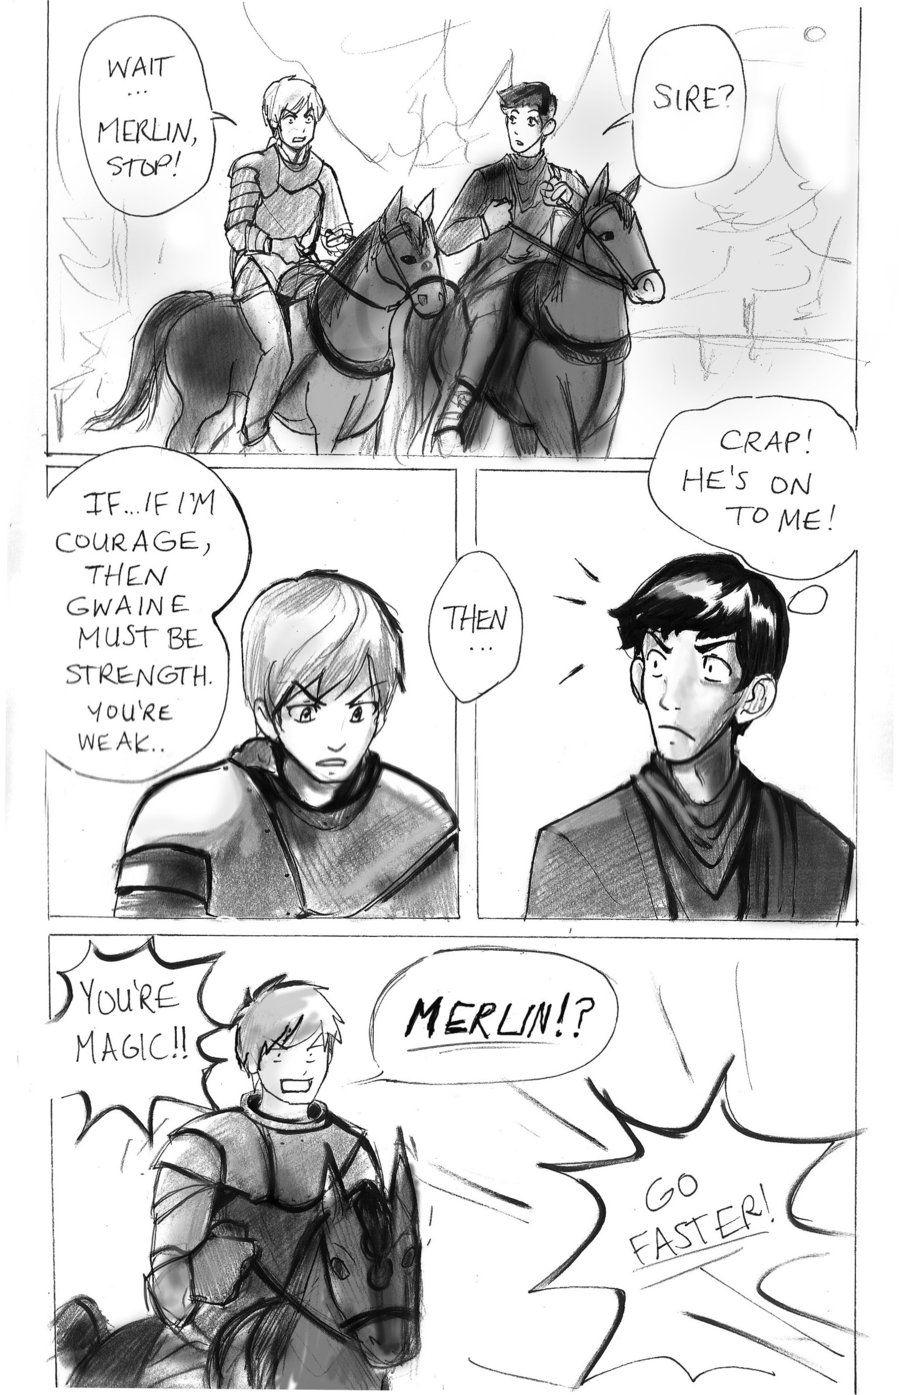 merlin magic reveal | Tumblr